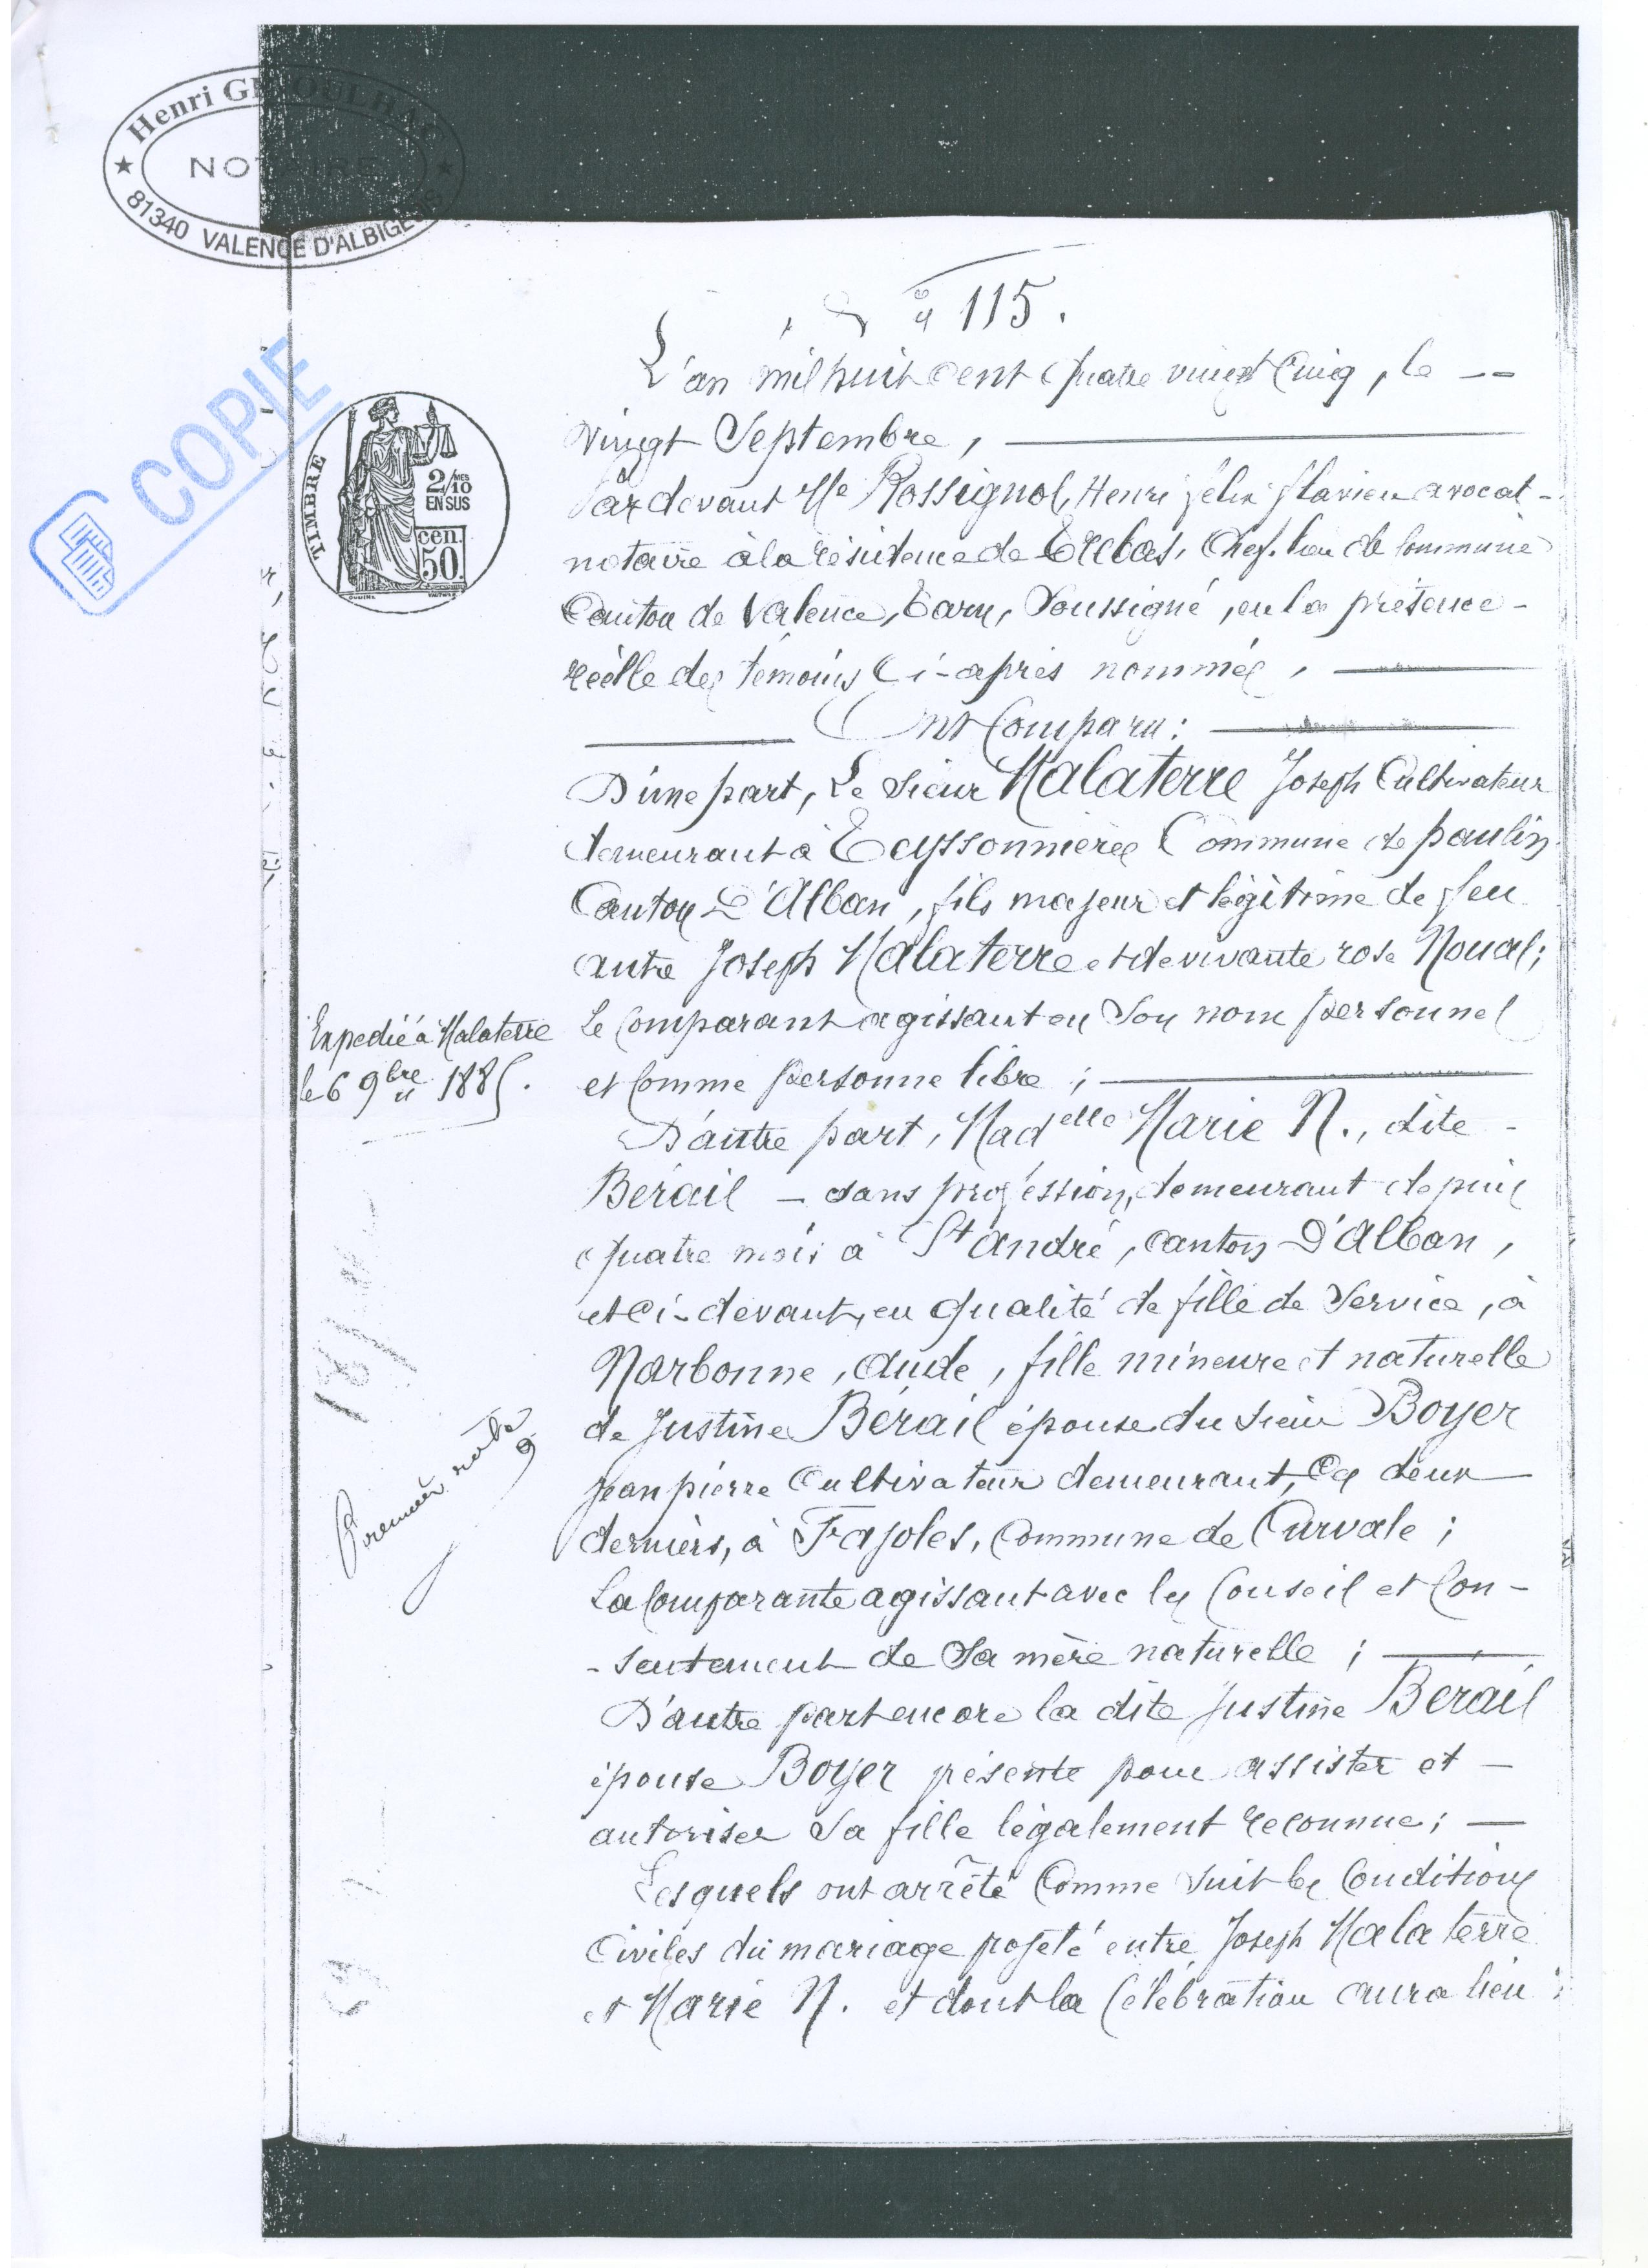 cm malaterre-beral 1885 p1